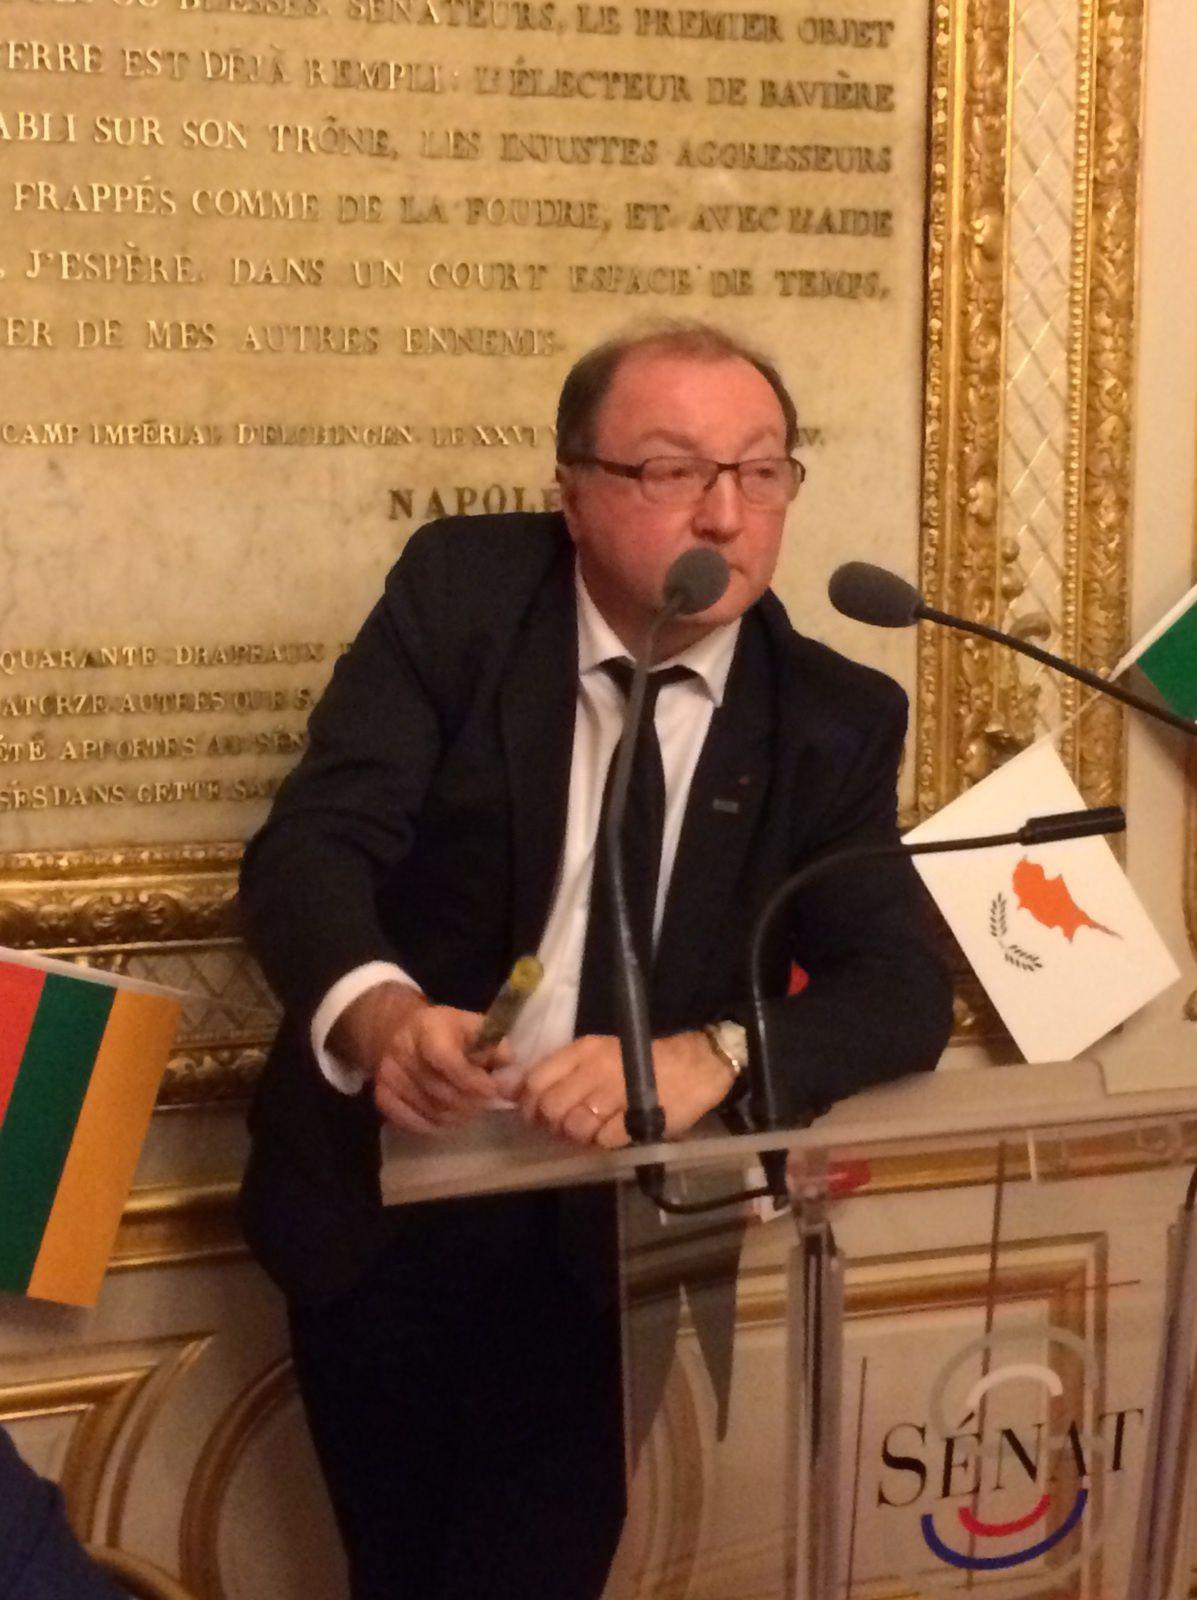 IGA Bruno SAINJON, Président de l'ONERA